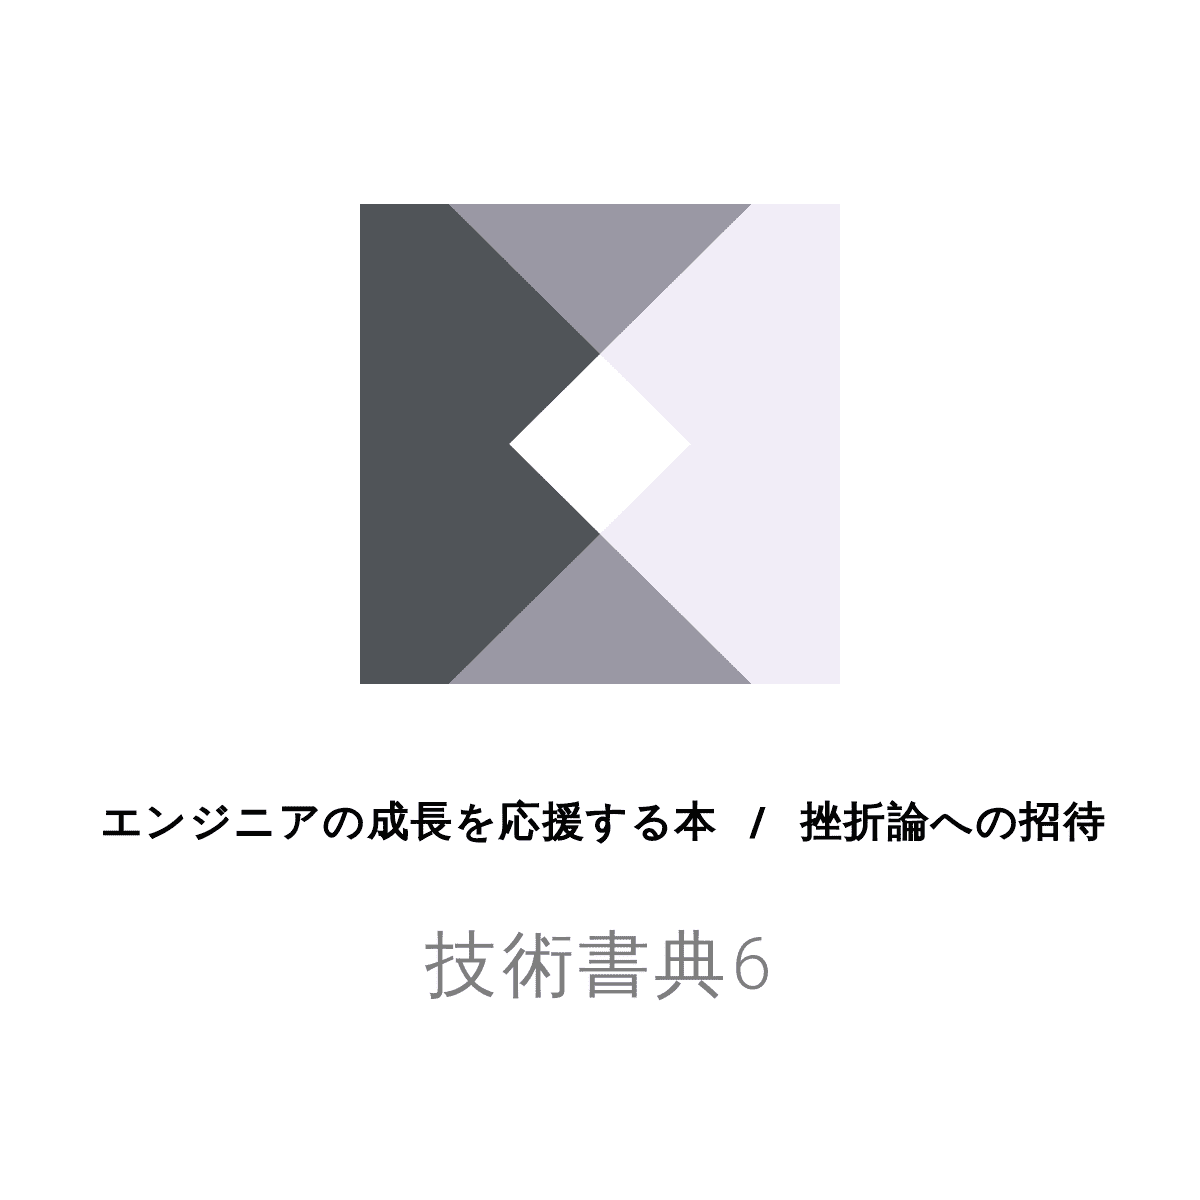 f:id:kic-yuuki:20190411091932p:plain